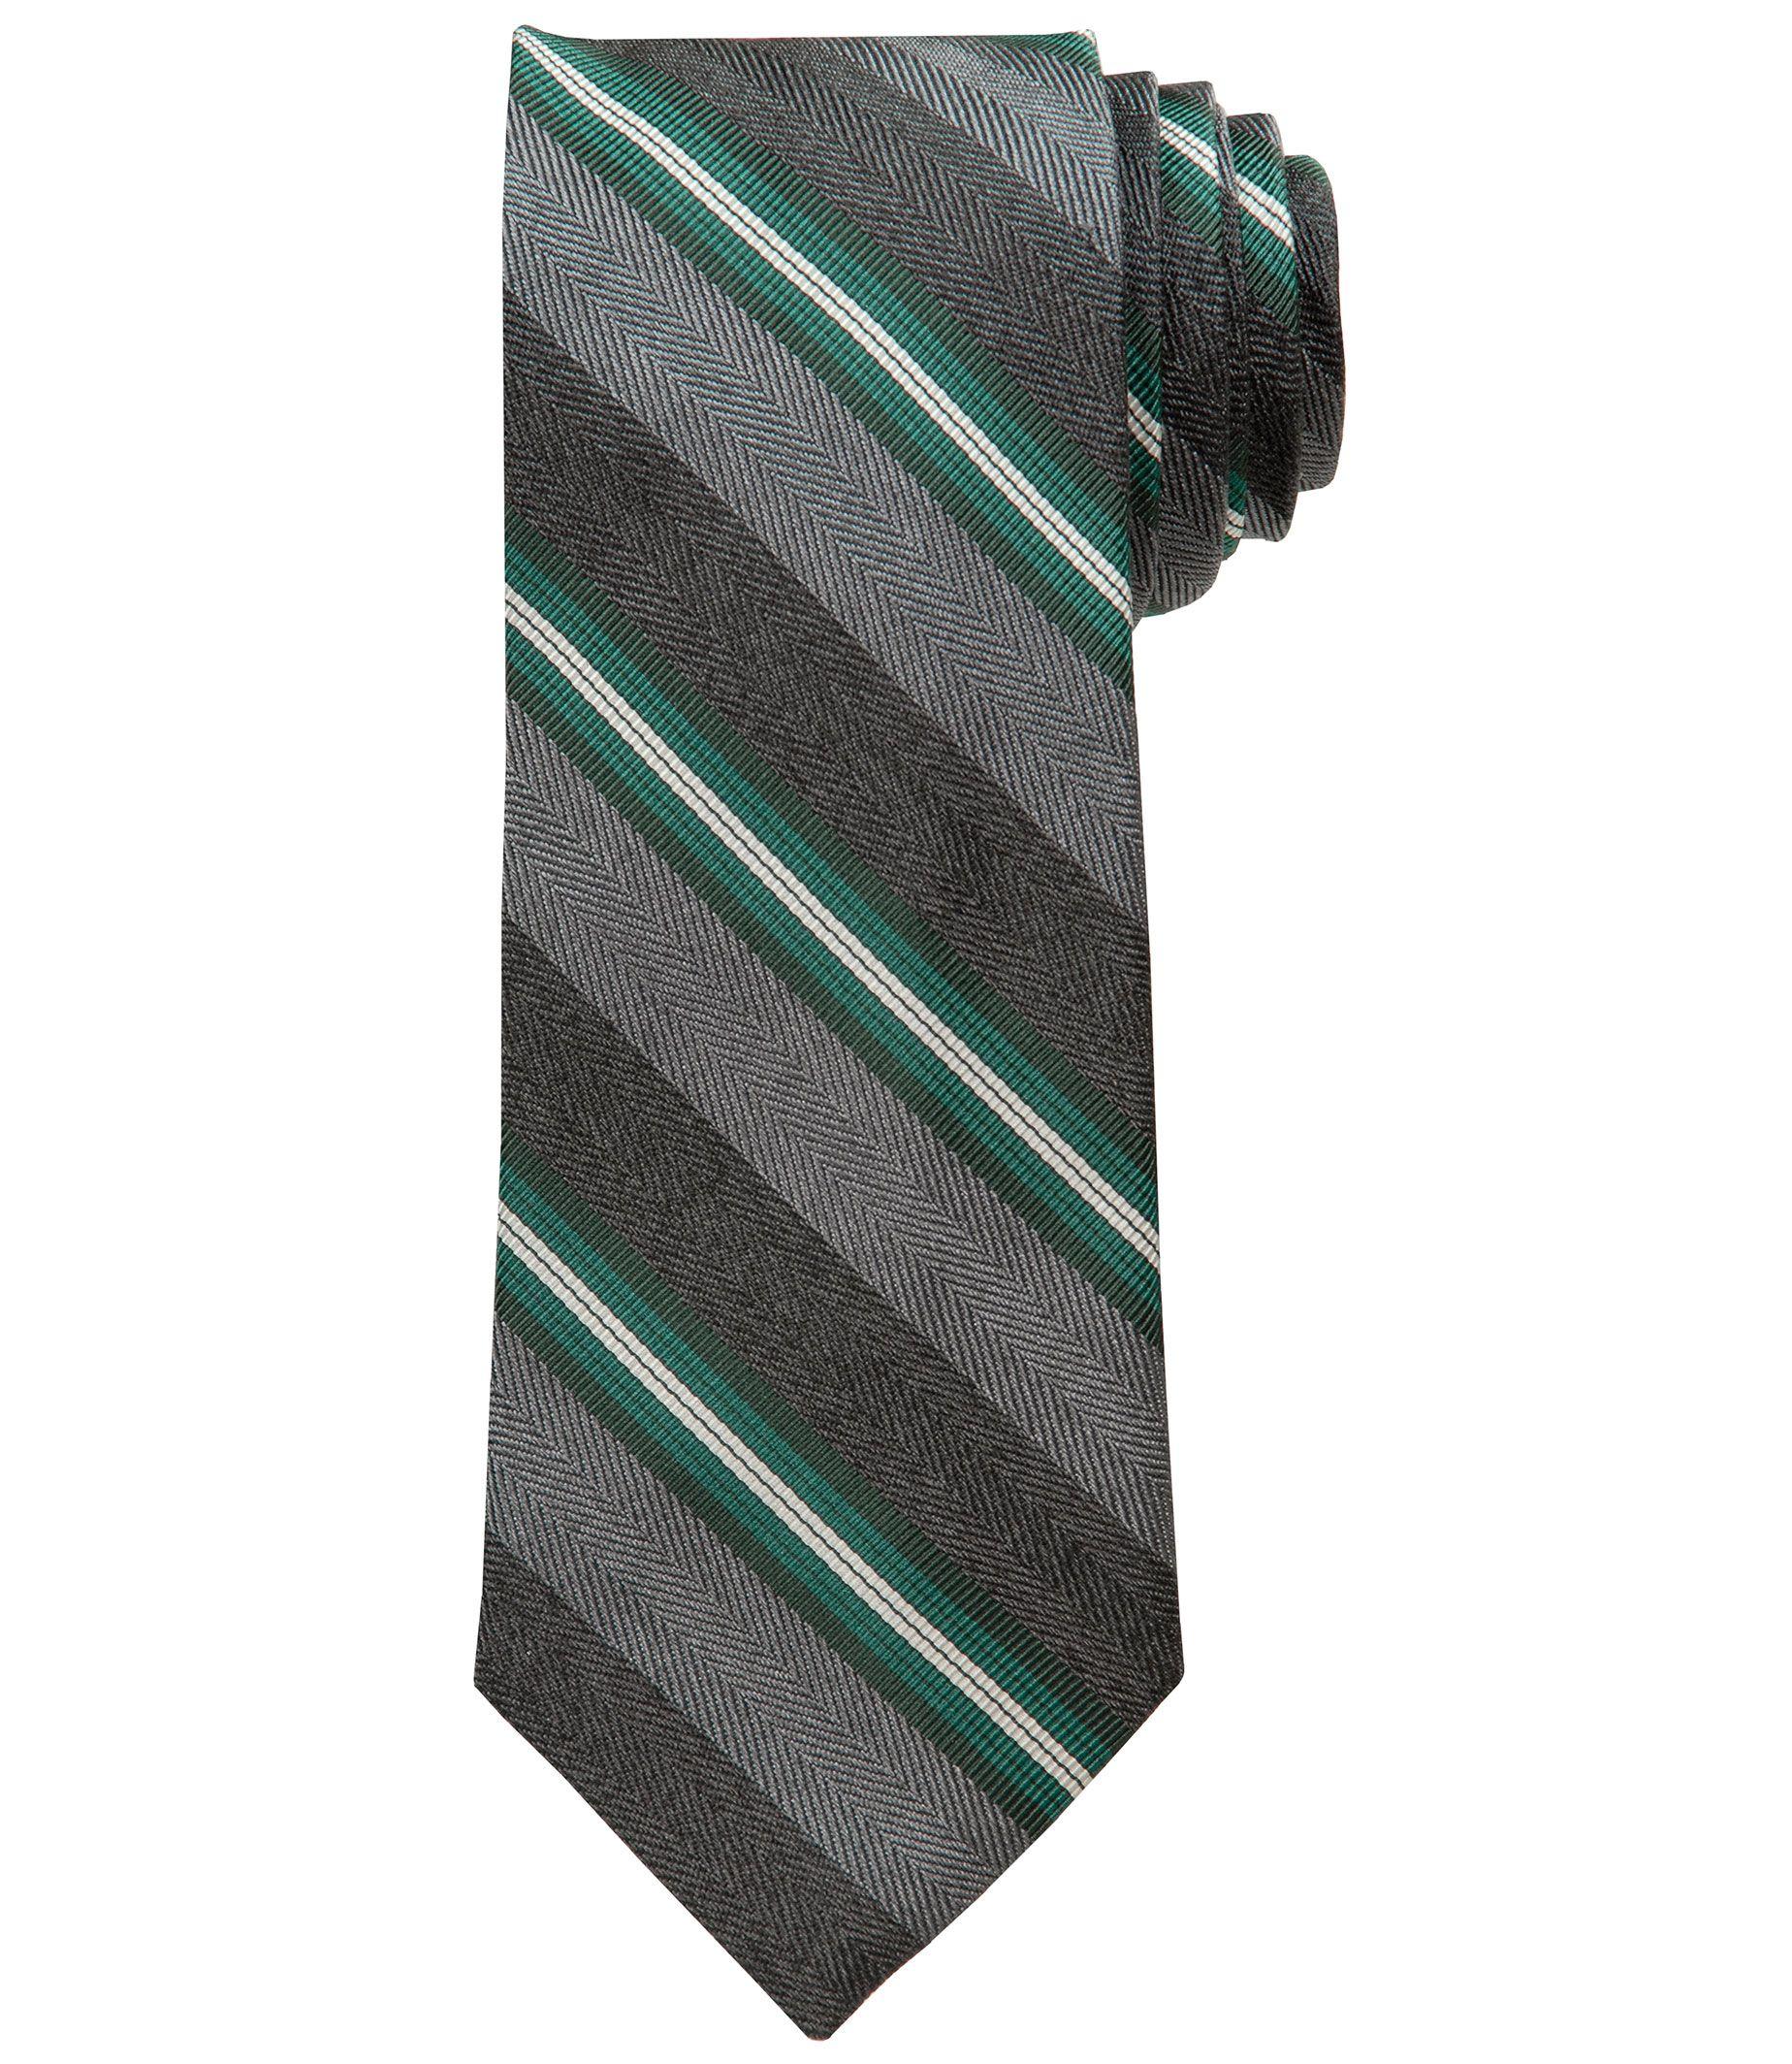 Joseph Stipe with Alternating Herringbone Tie